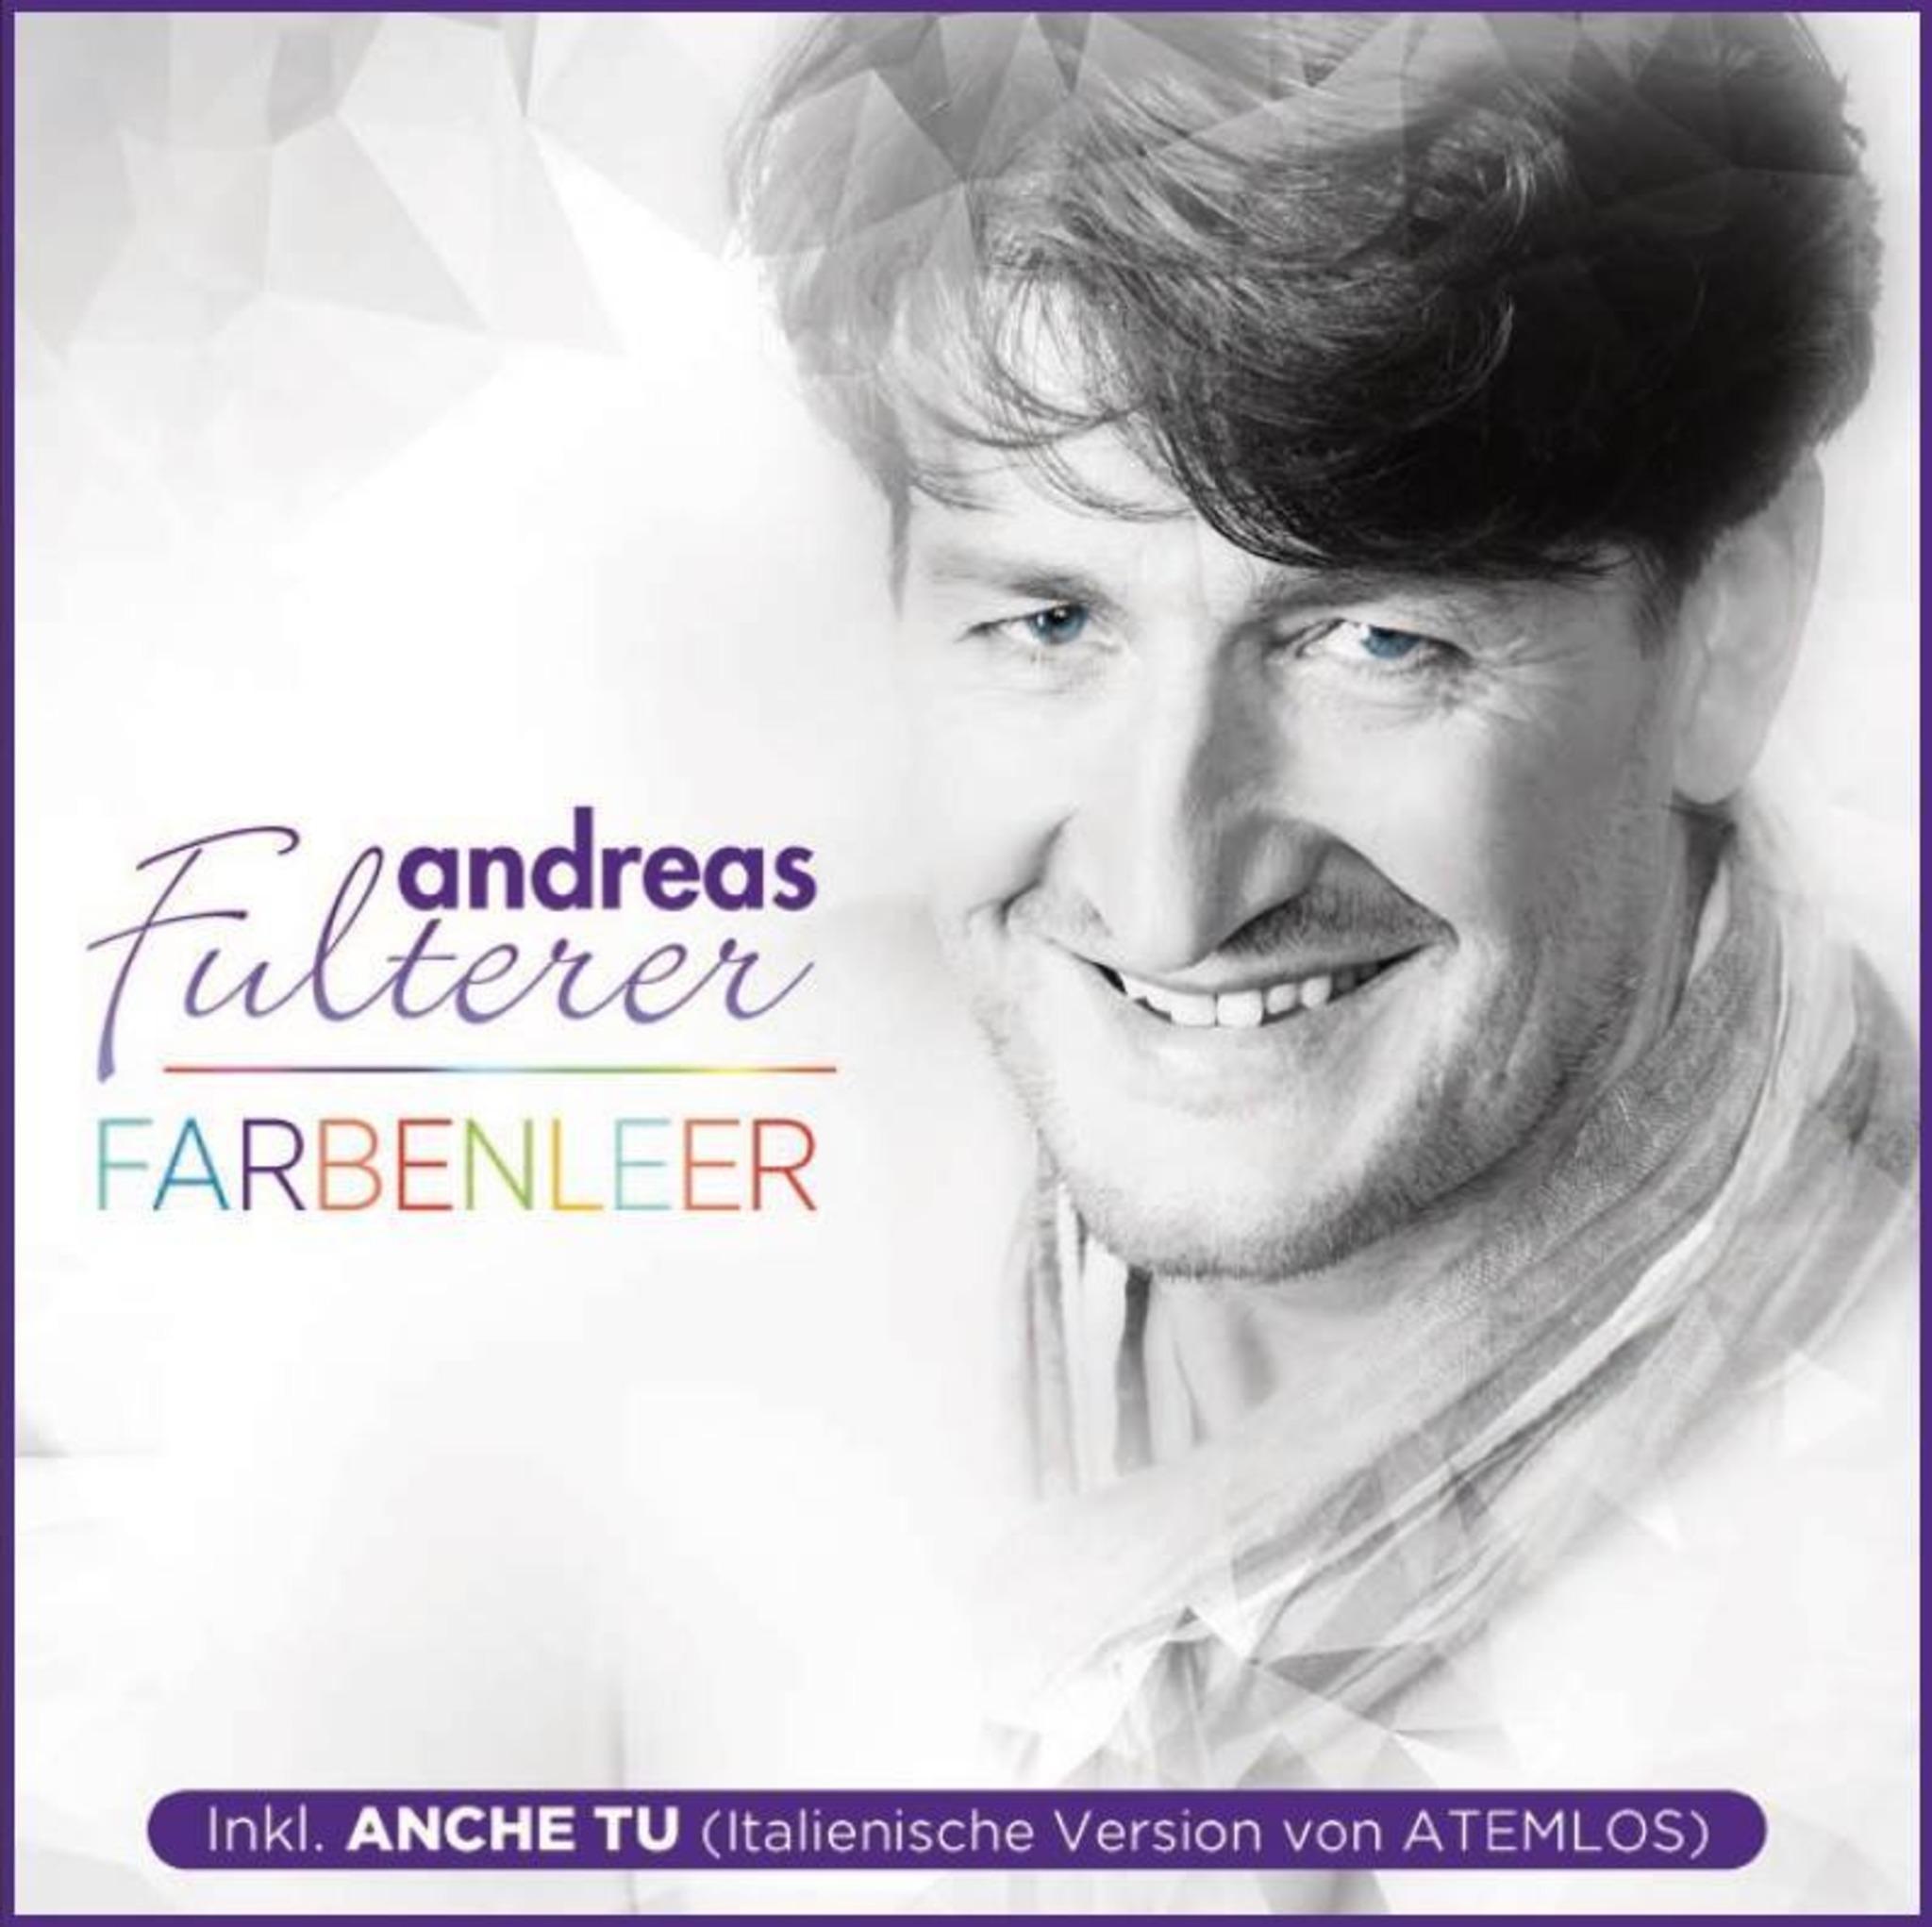 Andreas Fulterer Abschiedsbrief andreas fulterer, hat gekämpft, gehofft und doch verloren